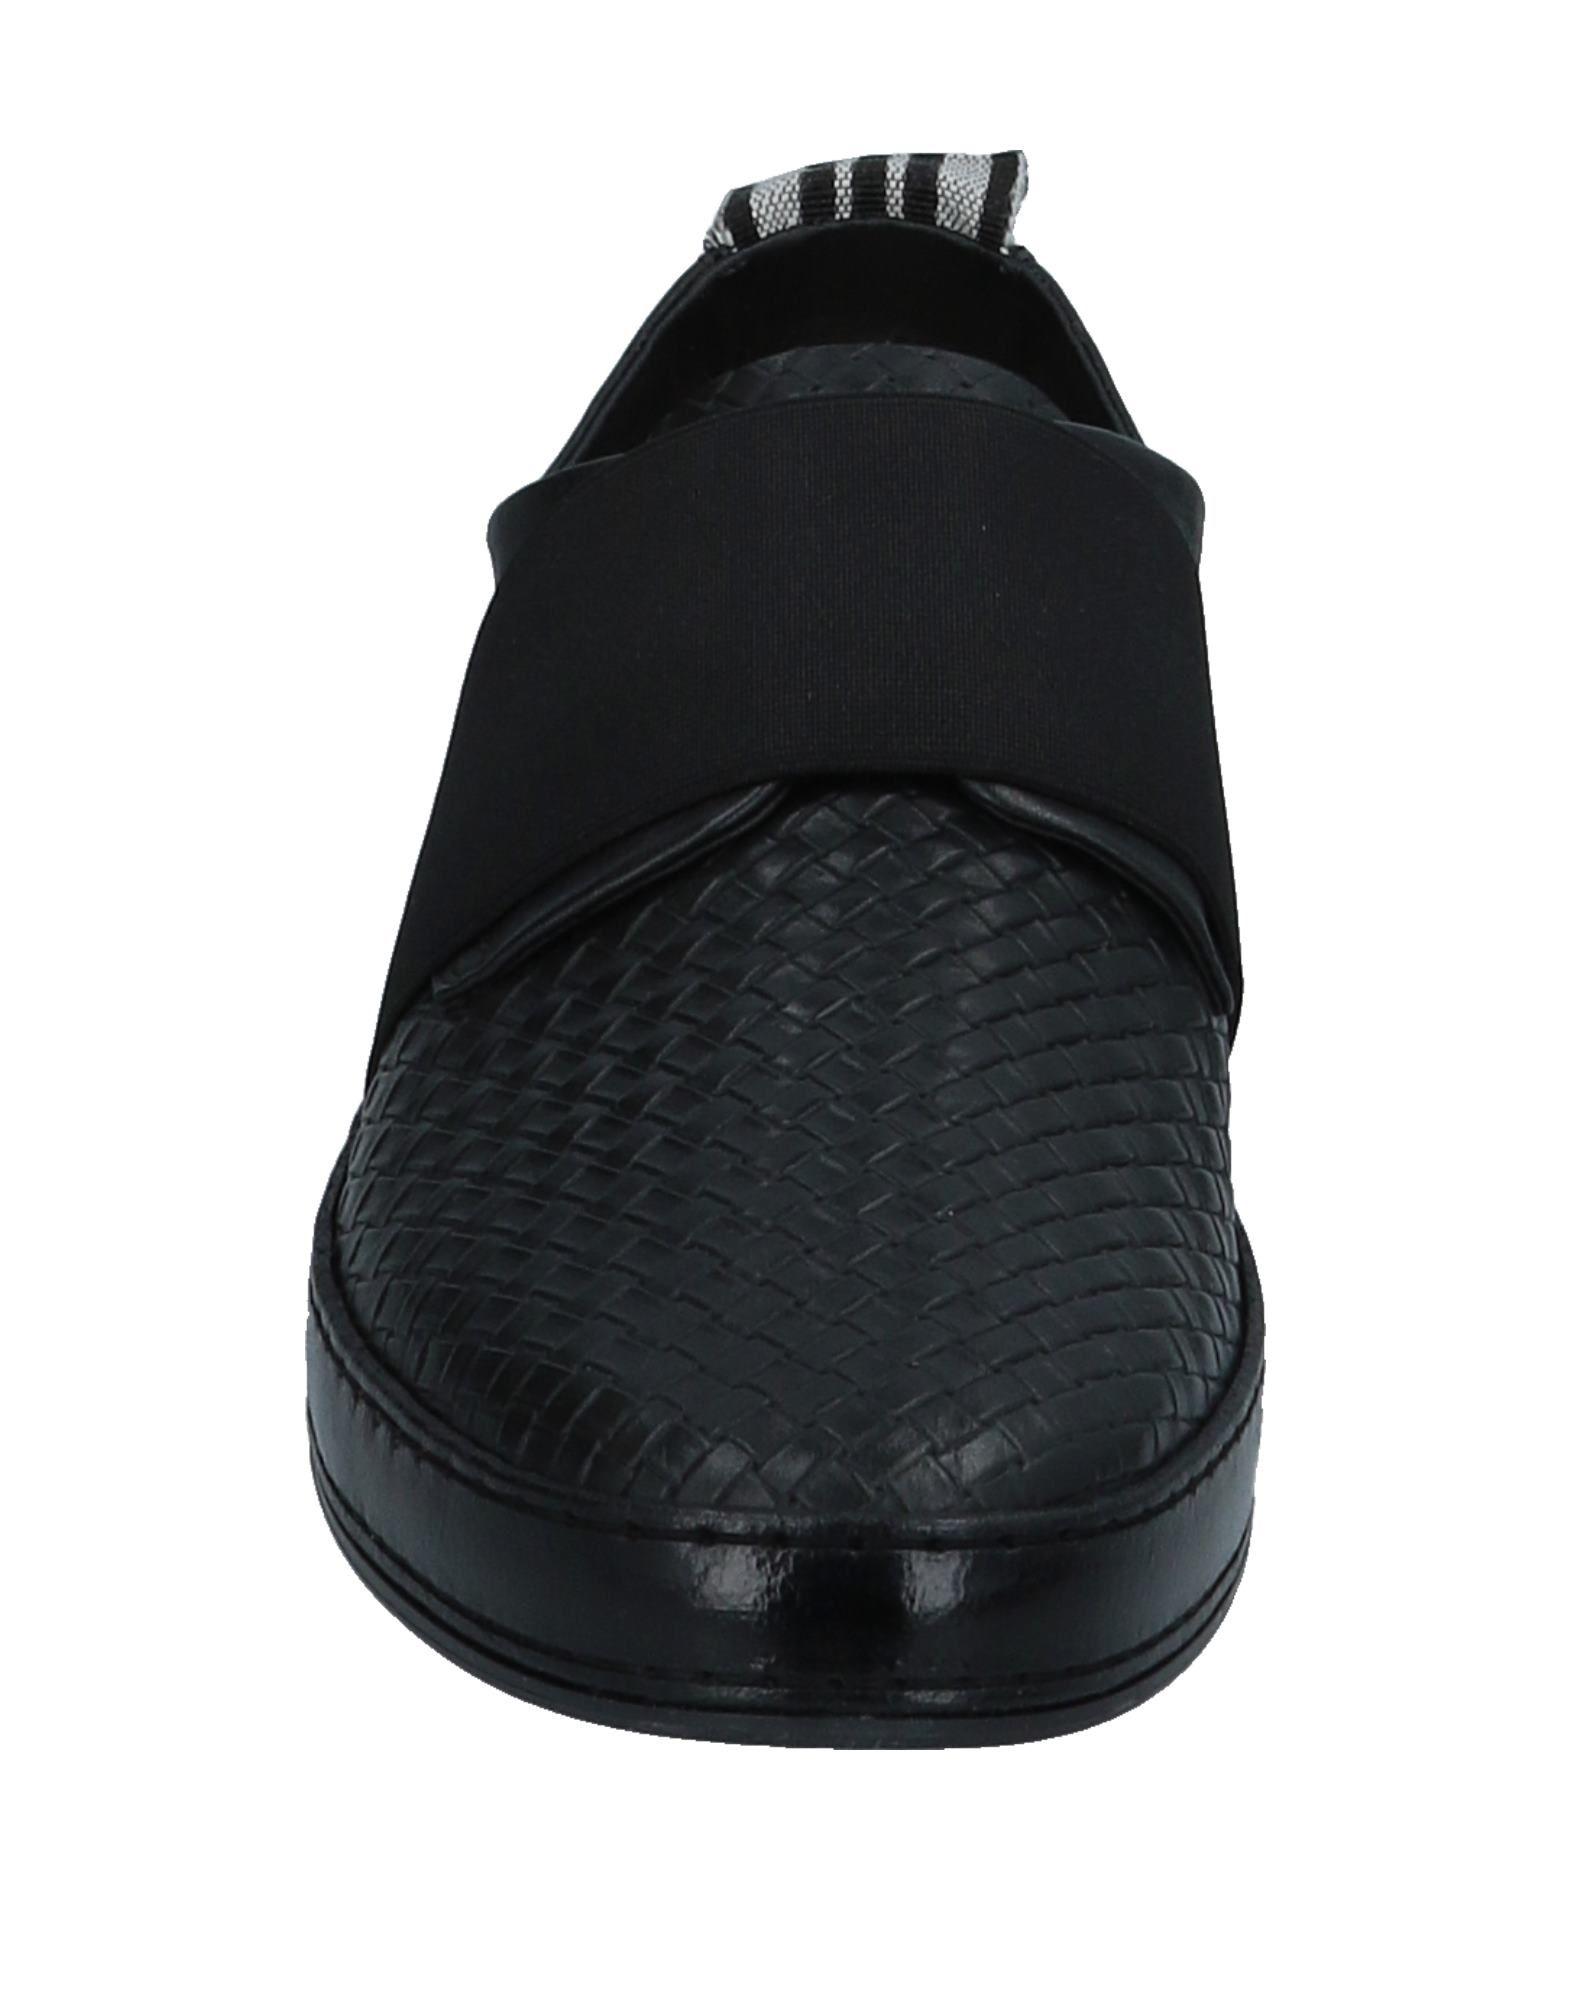 Rabatt echte Schuhe Herren Baldinini Trend Sneakers Herren Schuhe  11538937GF d87725